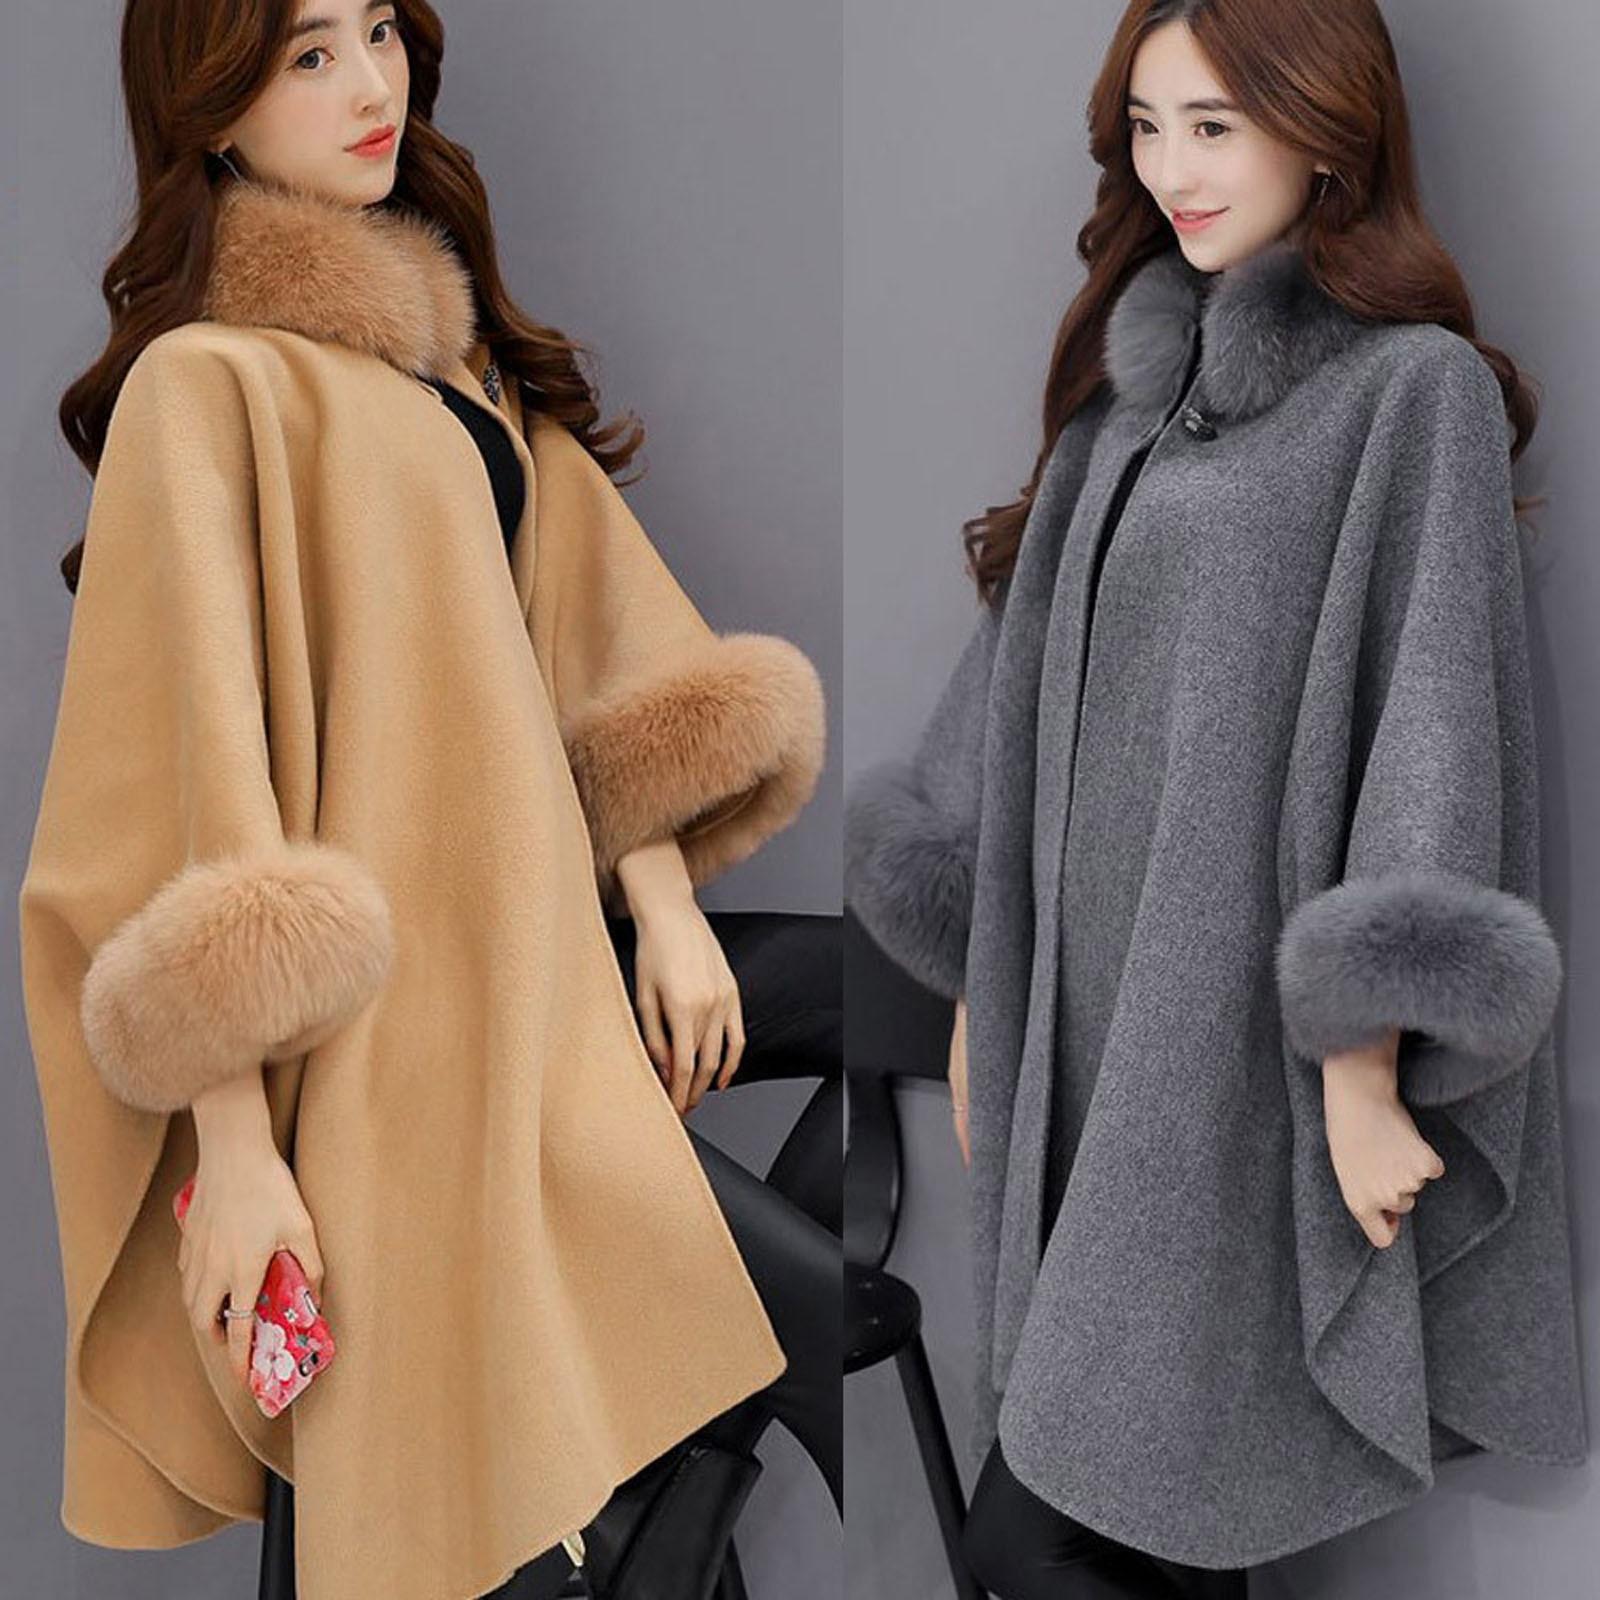 Las mujeres abrigo de lana chaqueta de moda casuales de lana prendas...